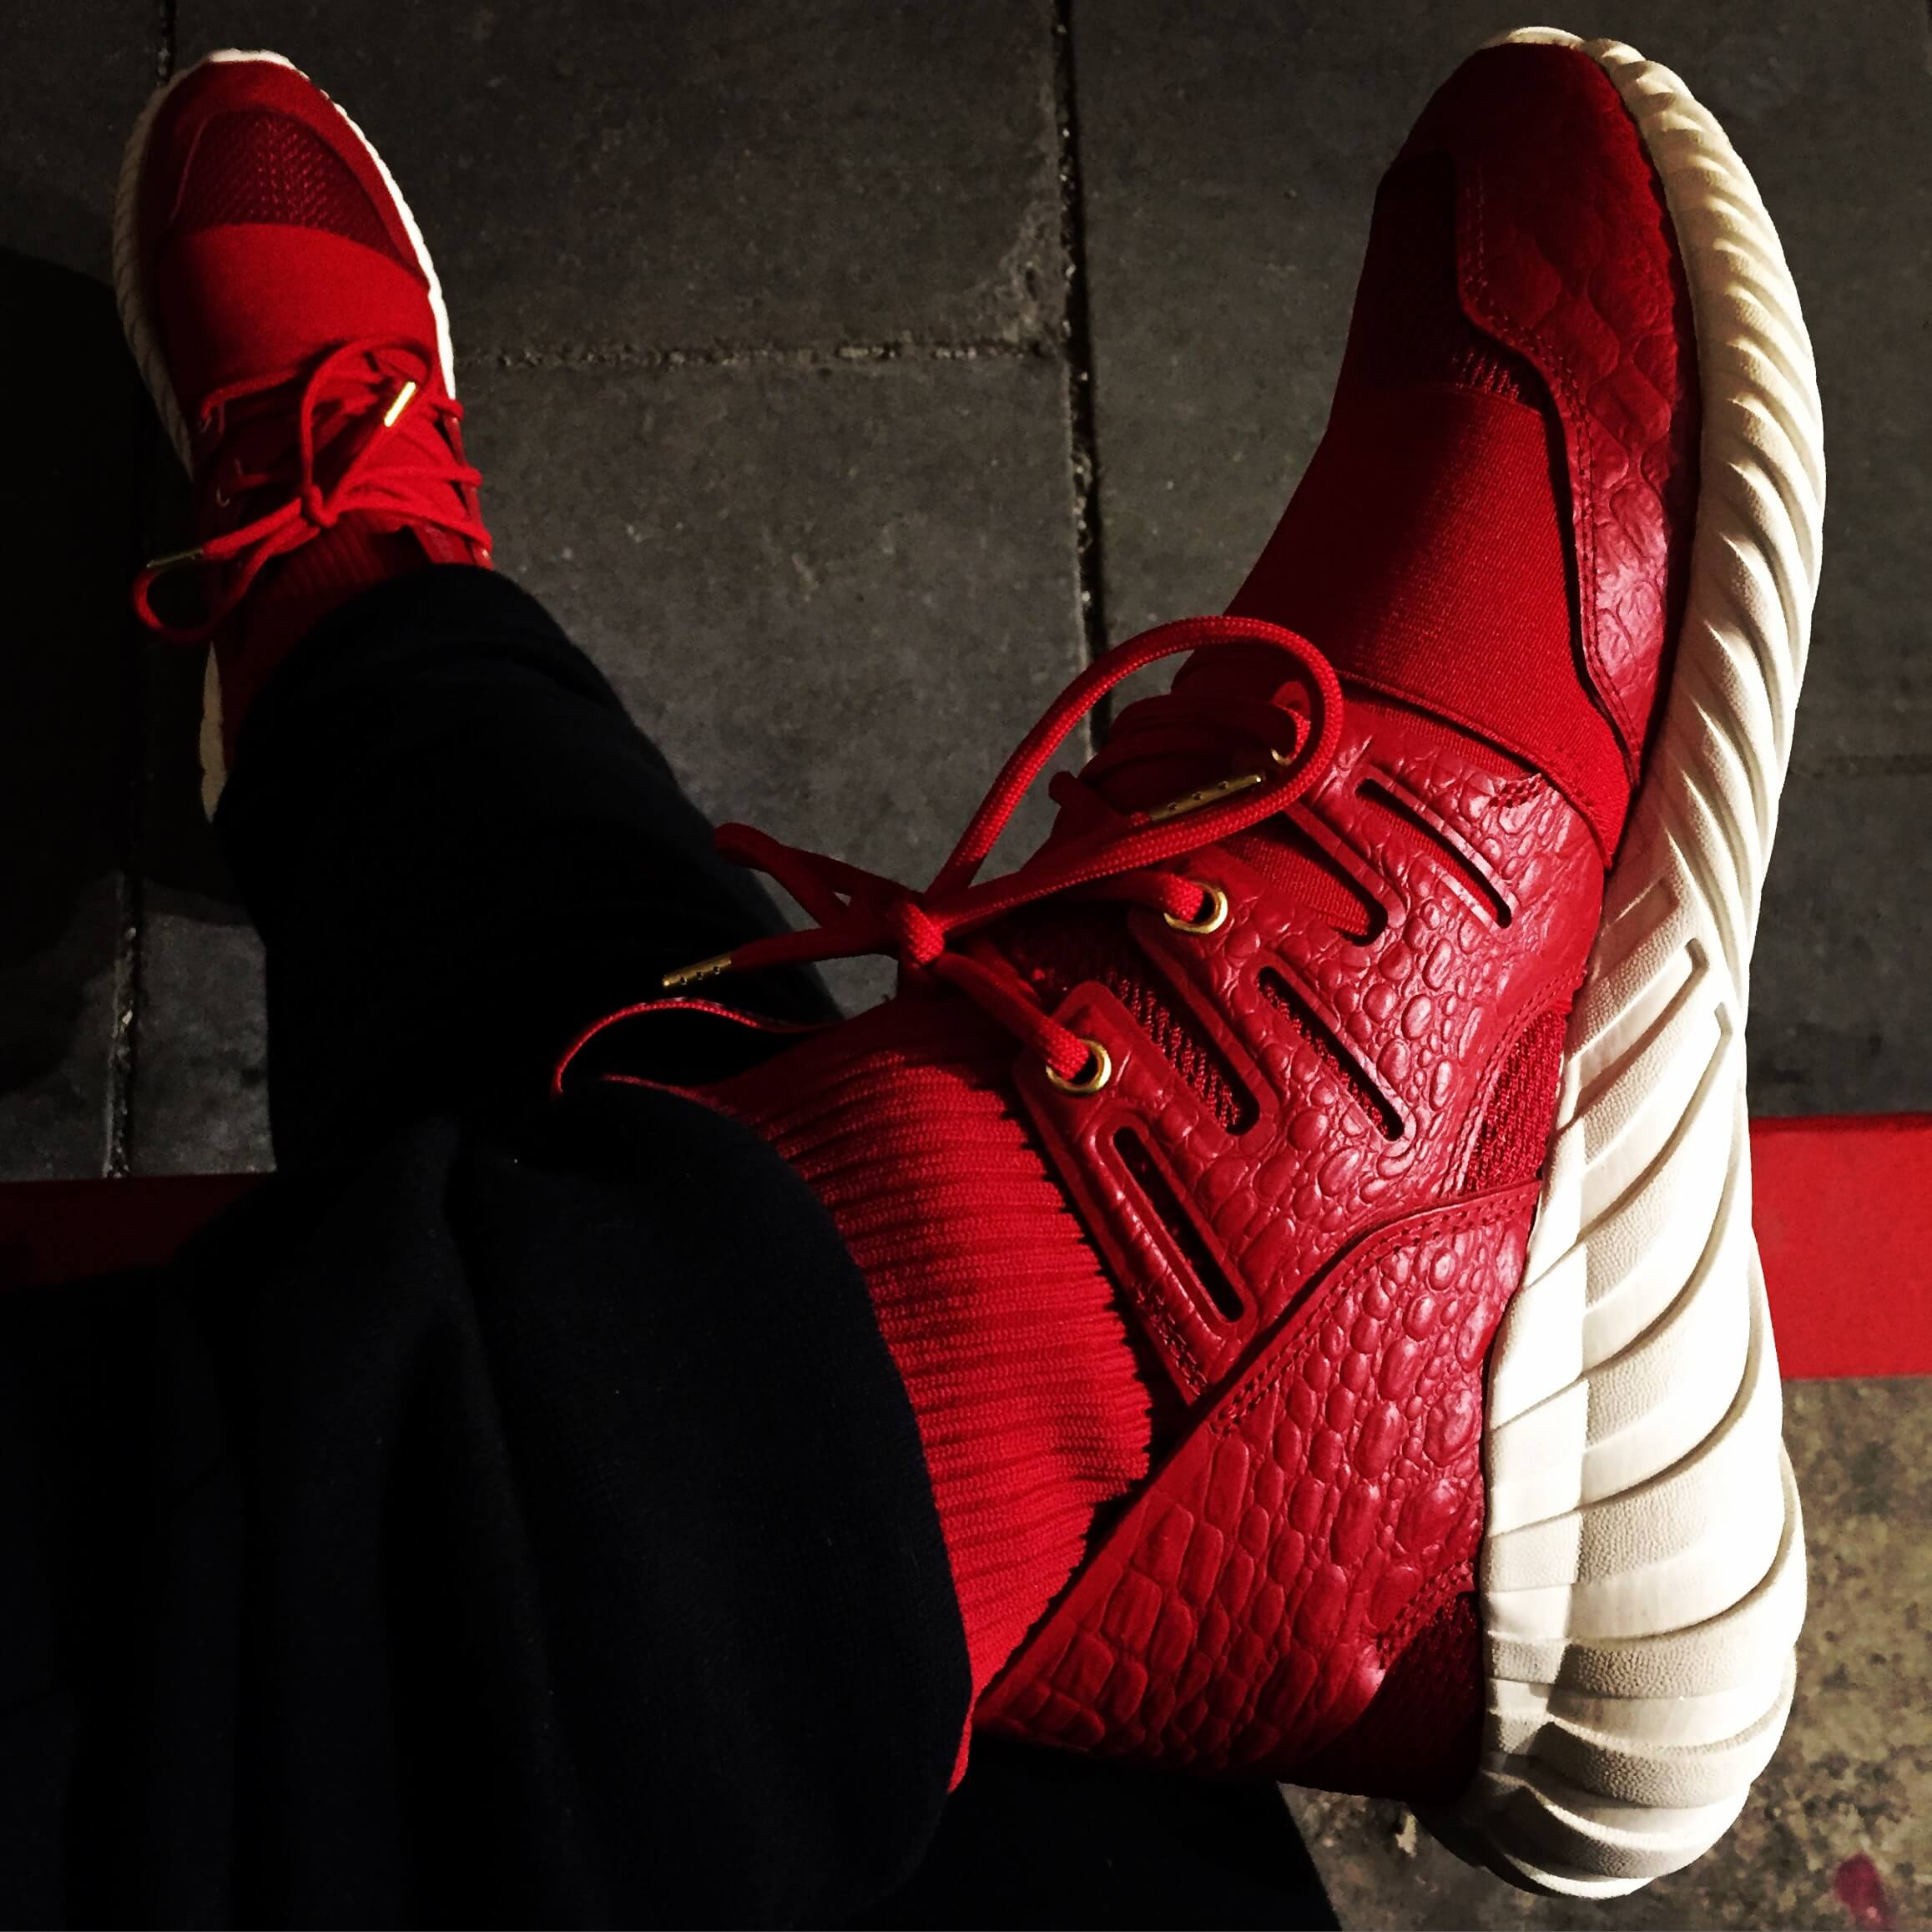 Adidas-Tubular-Doom-Chinese-New-Year-Top-View-Benstah-Onfeet